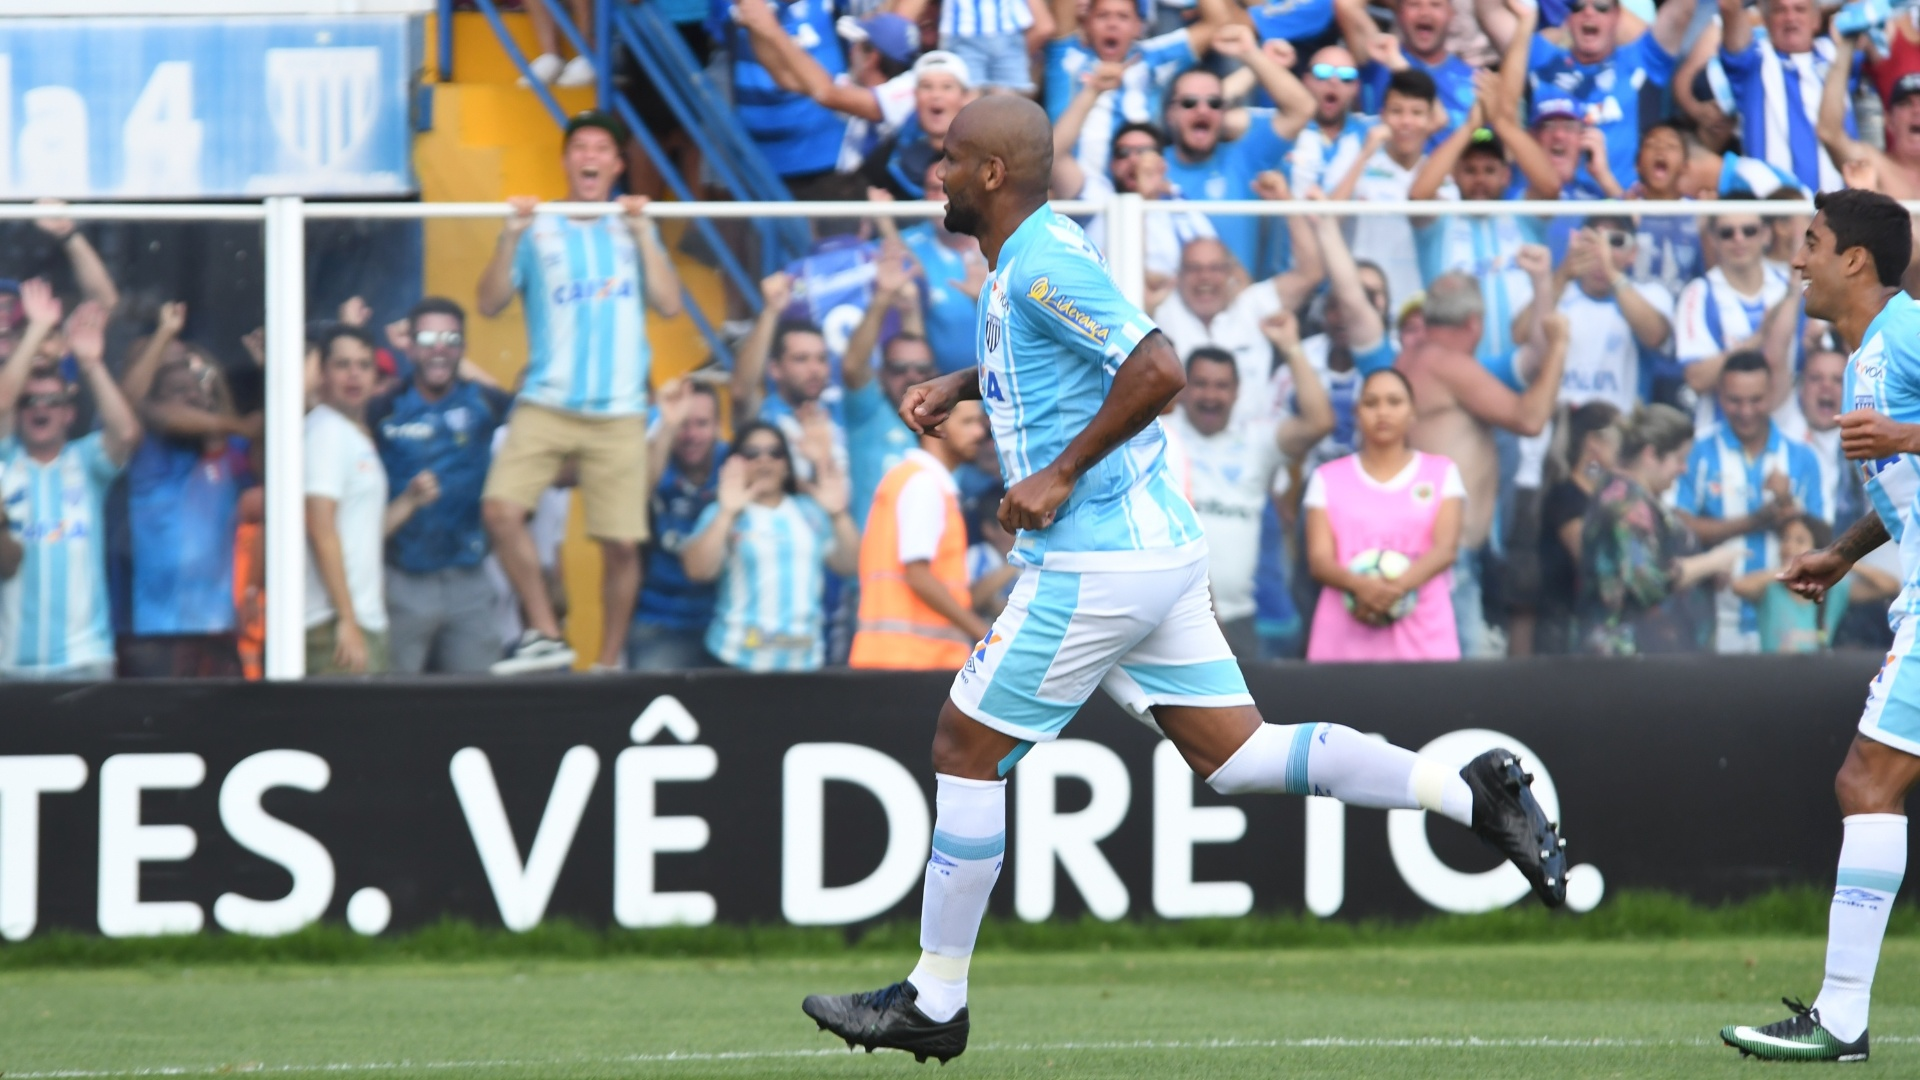 Maicon comemora gol do Avaí contra o Atlético-PR